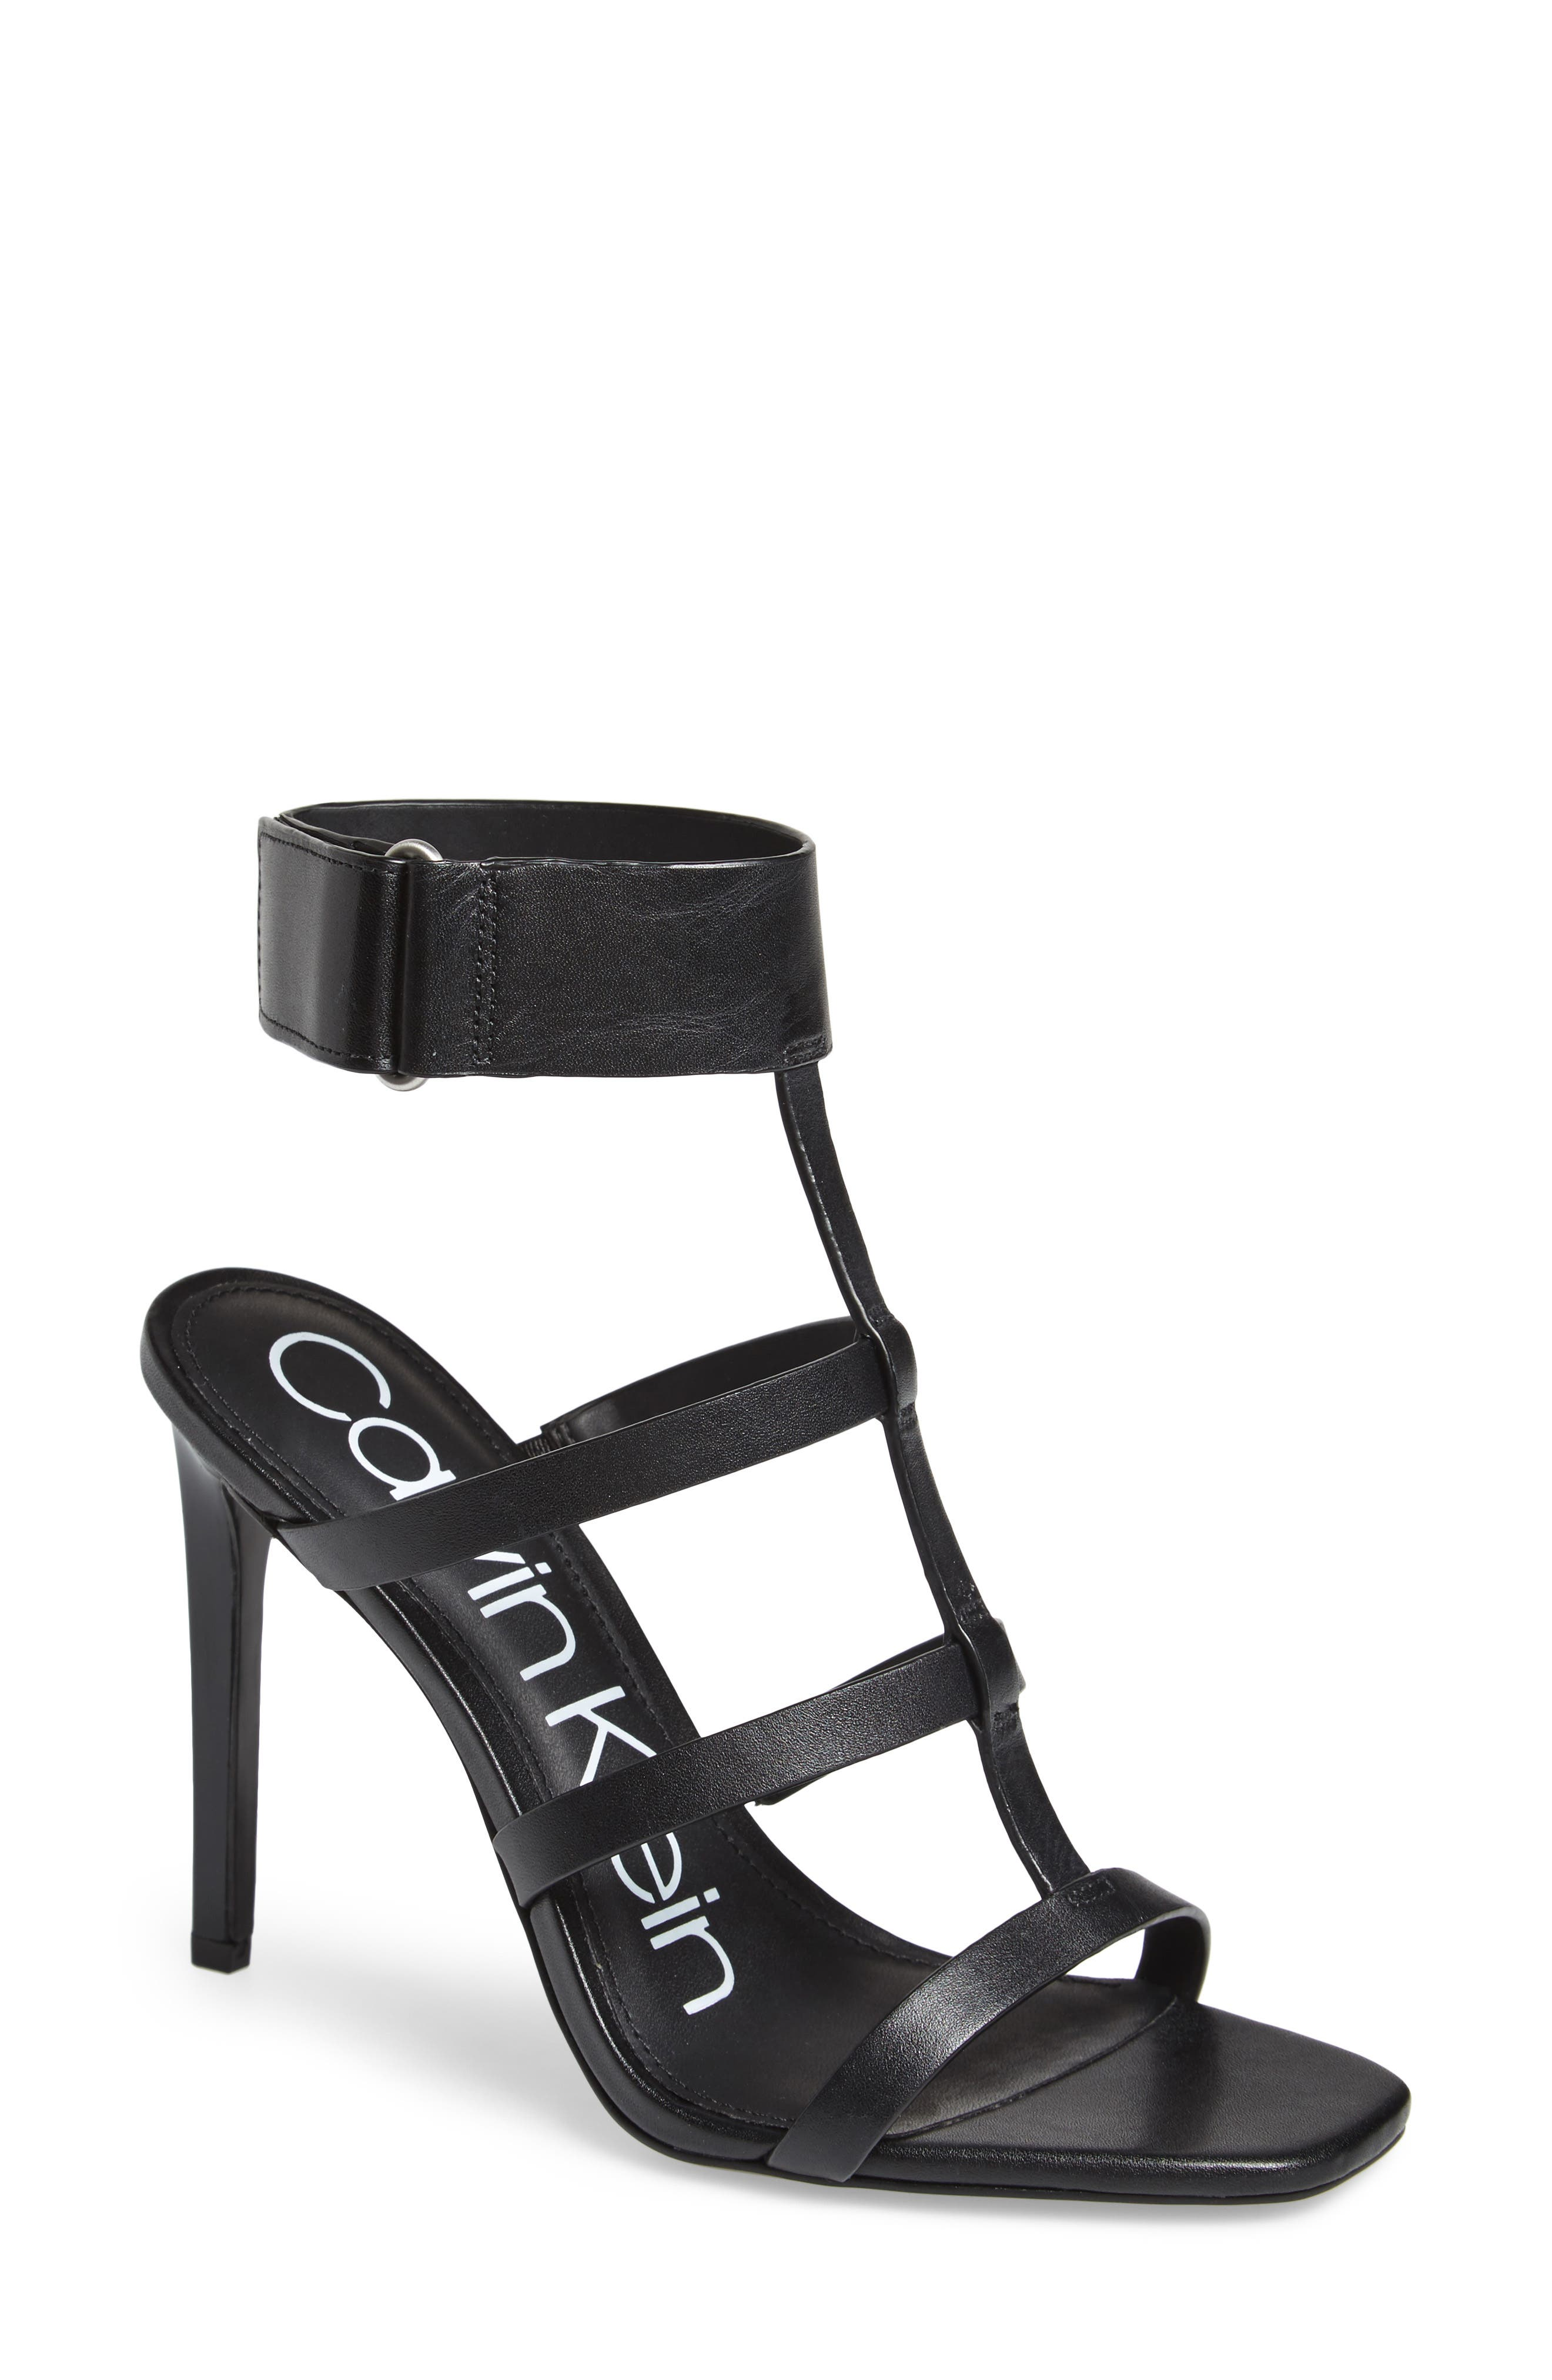 Main Image - Calvin Klein Dolcita Strappy Sandal (Women)